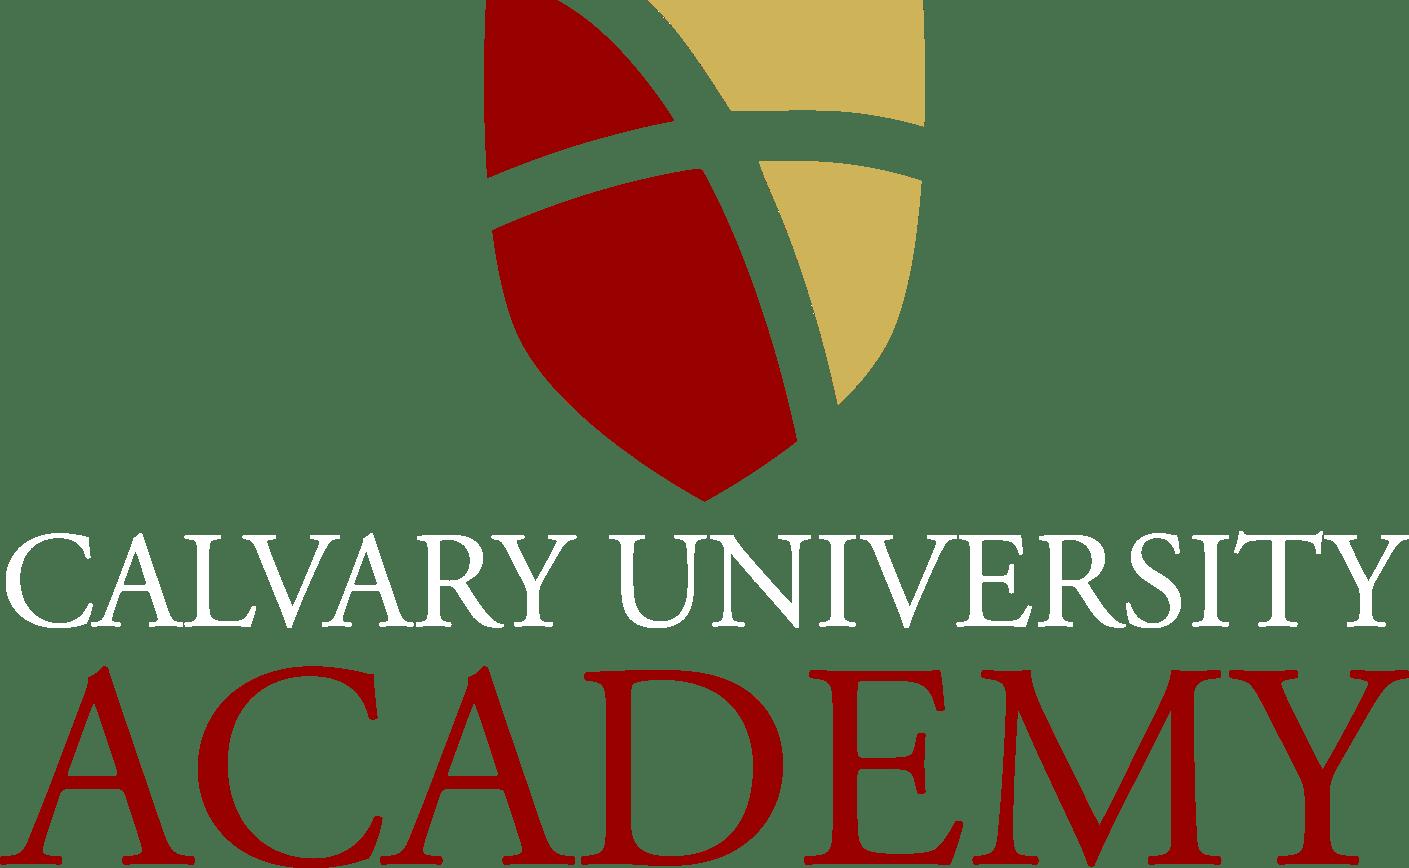 Cua Academic Calendar 2020 Calvary University Academy   Calvary University